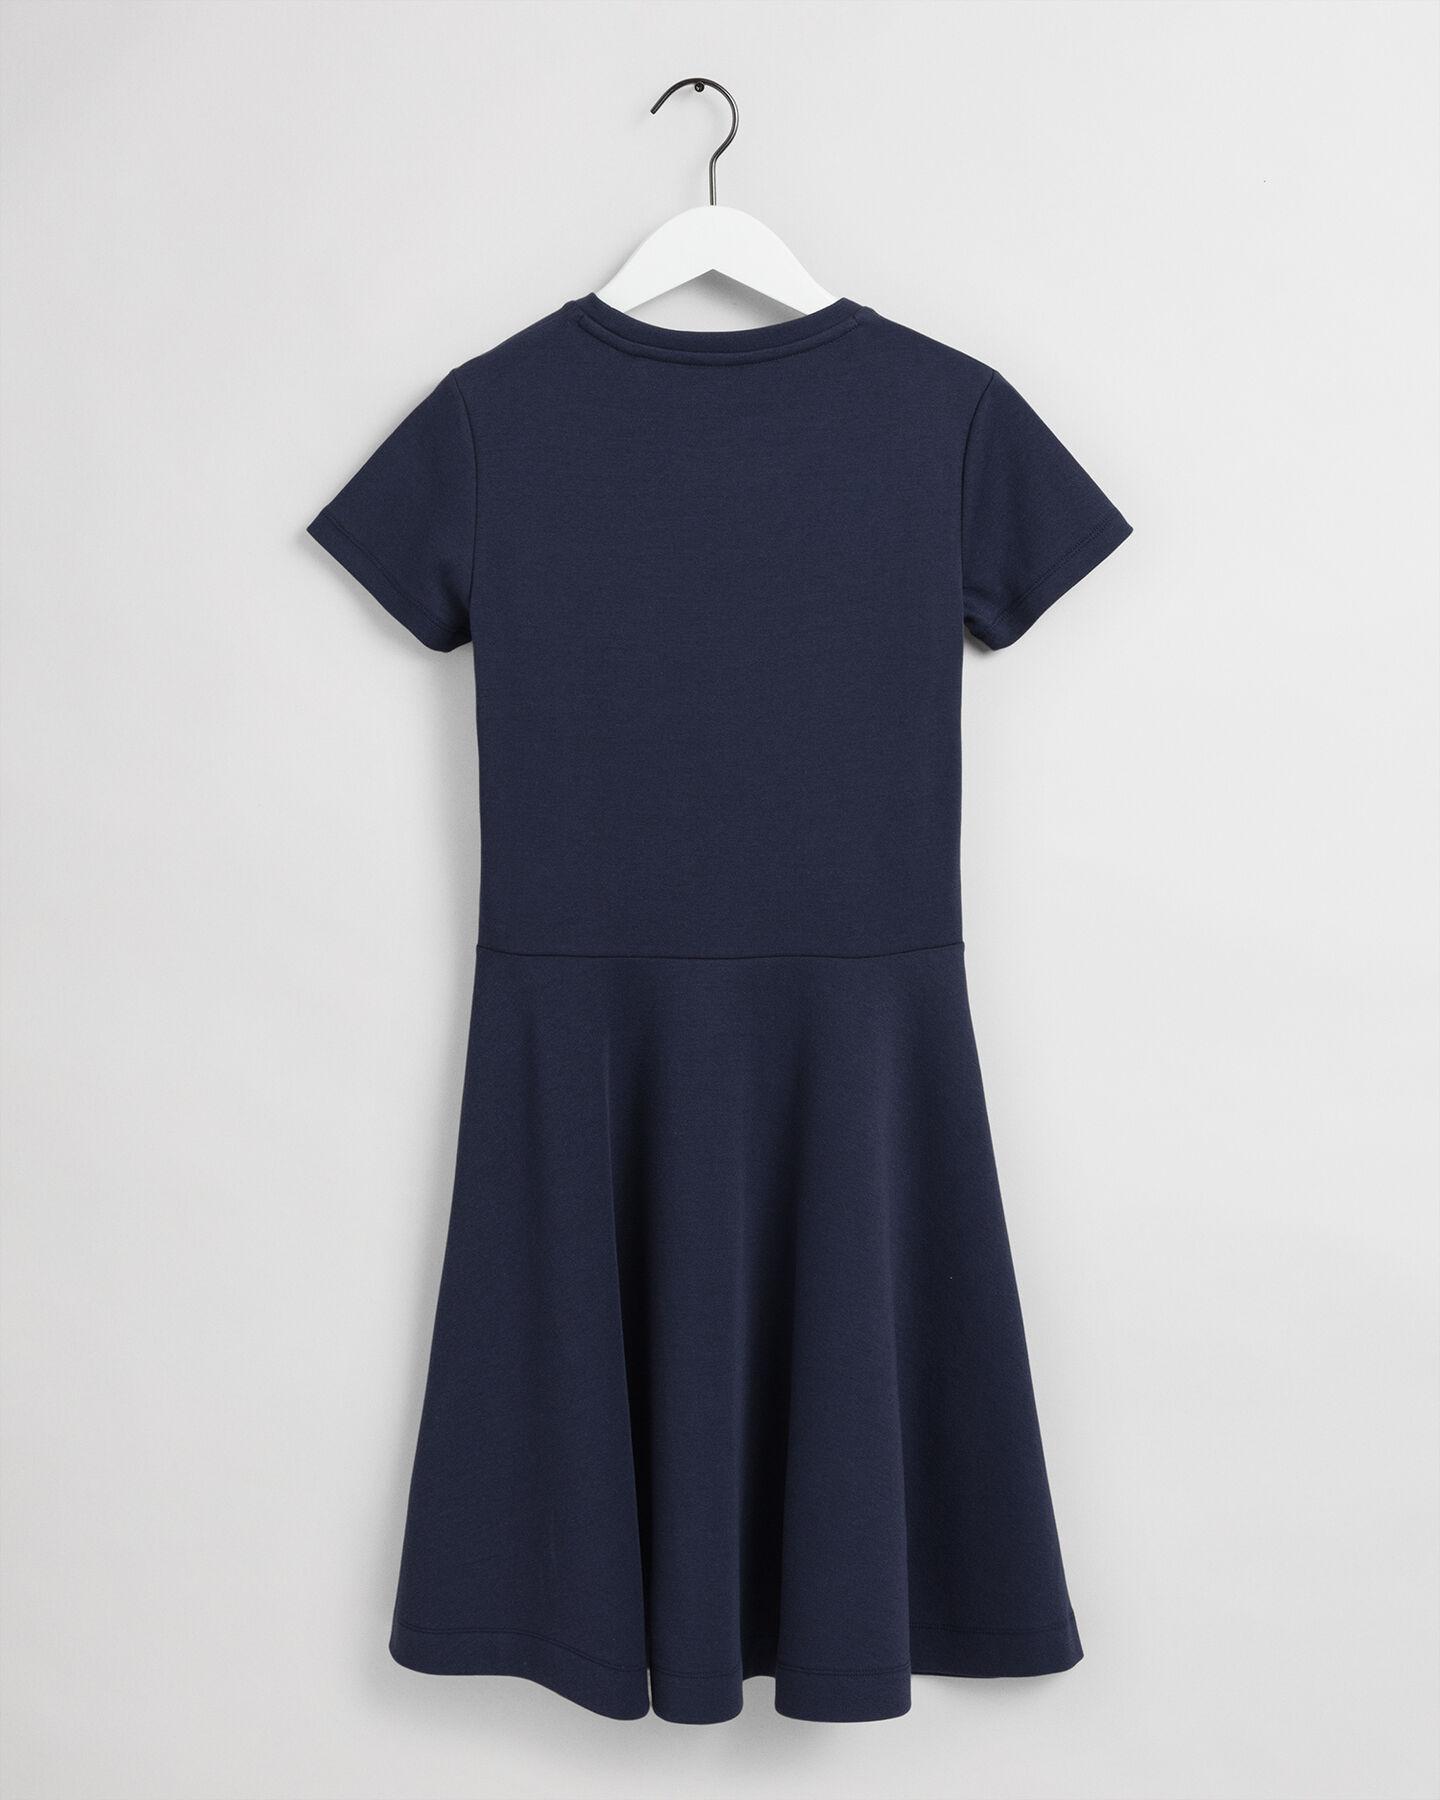 Teen Girls Original jerseyklänning